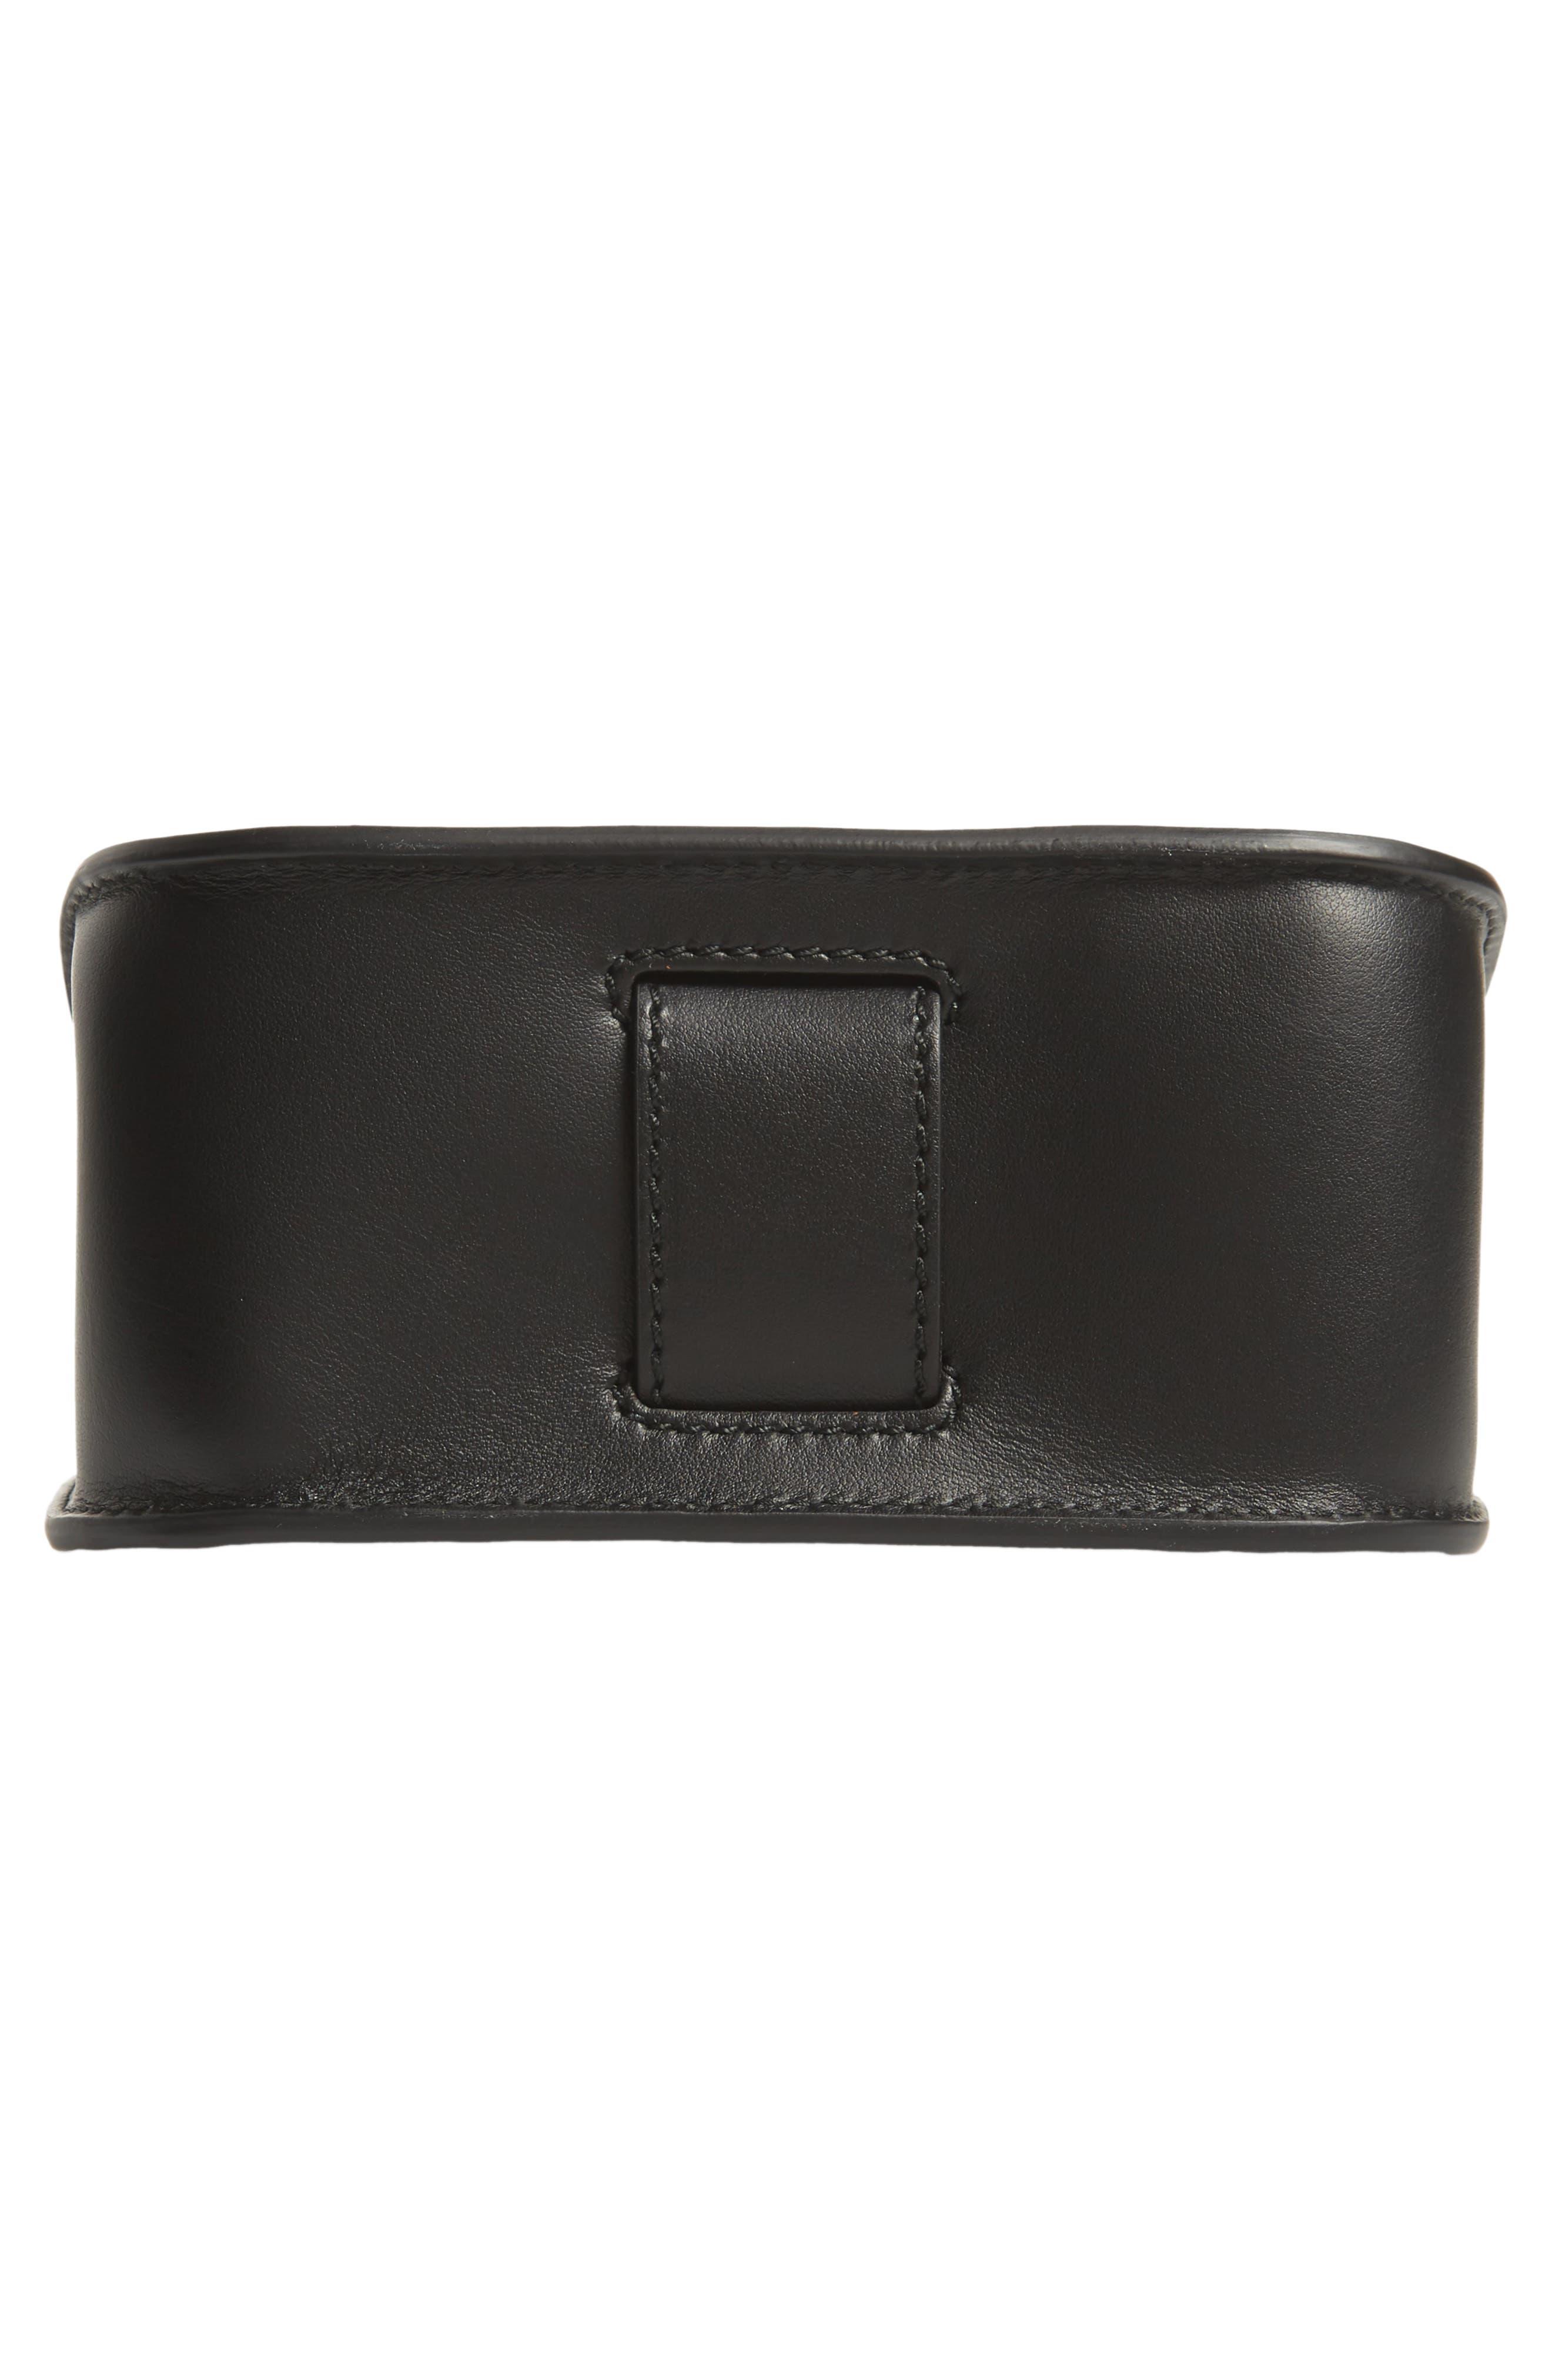 PROENZA SCHOULER, PS11 Box Leather Crossbody Bag, Alternate thumbnail 6, color, BLACK